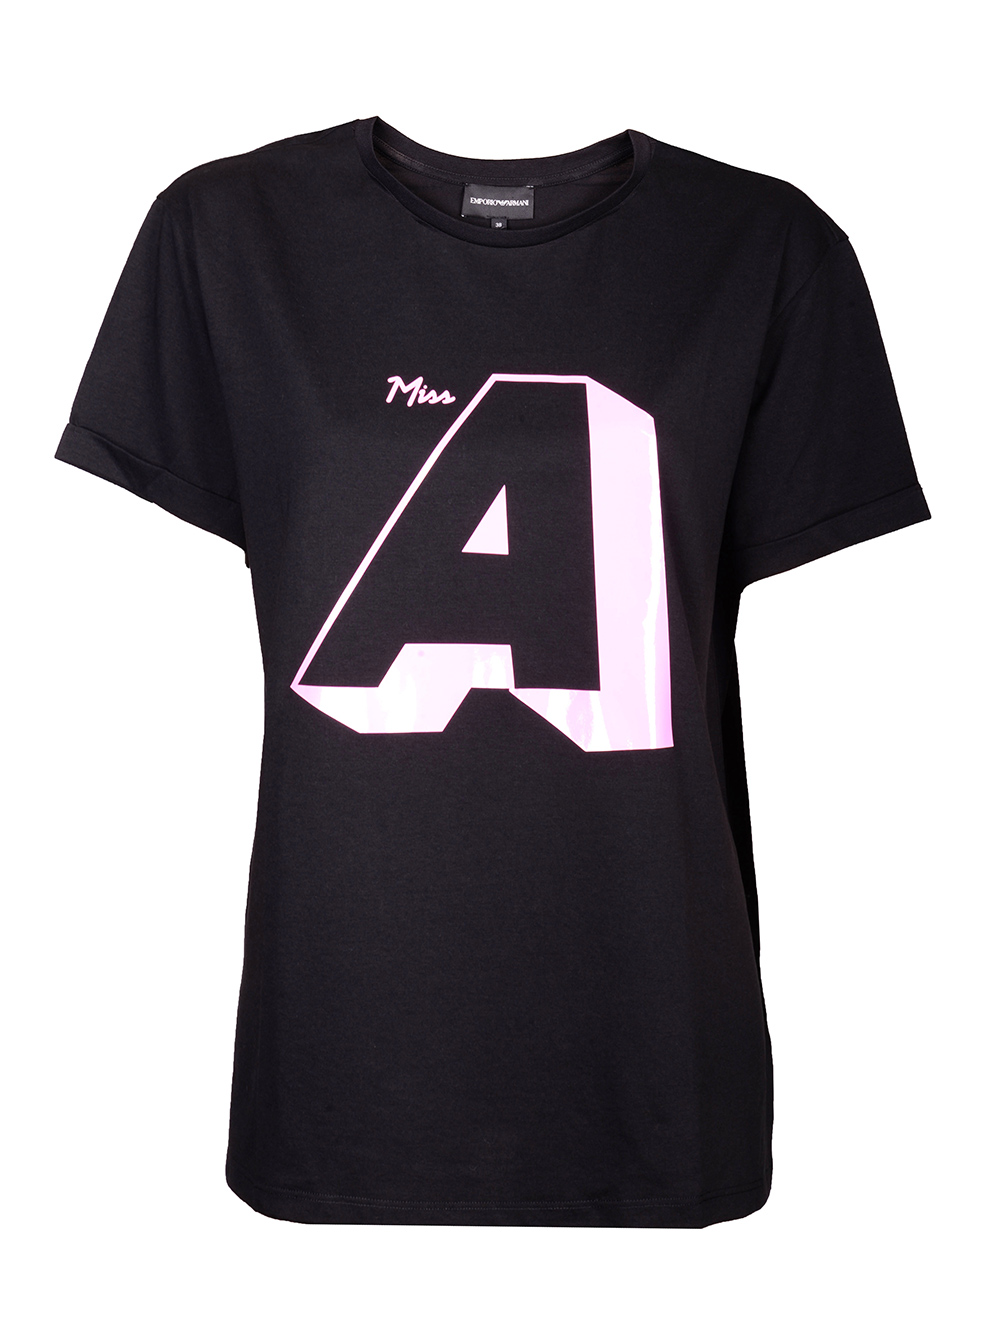 EMPORIO ARMANI Μπλούζα T-shirt 6G2T7R 2J4CZ ΜΑΥΡΟ